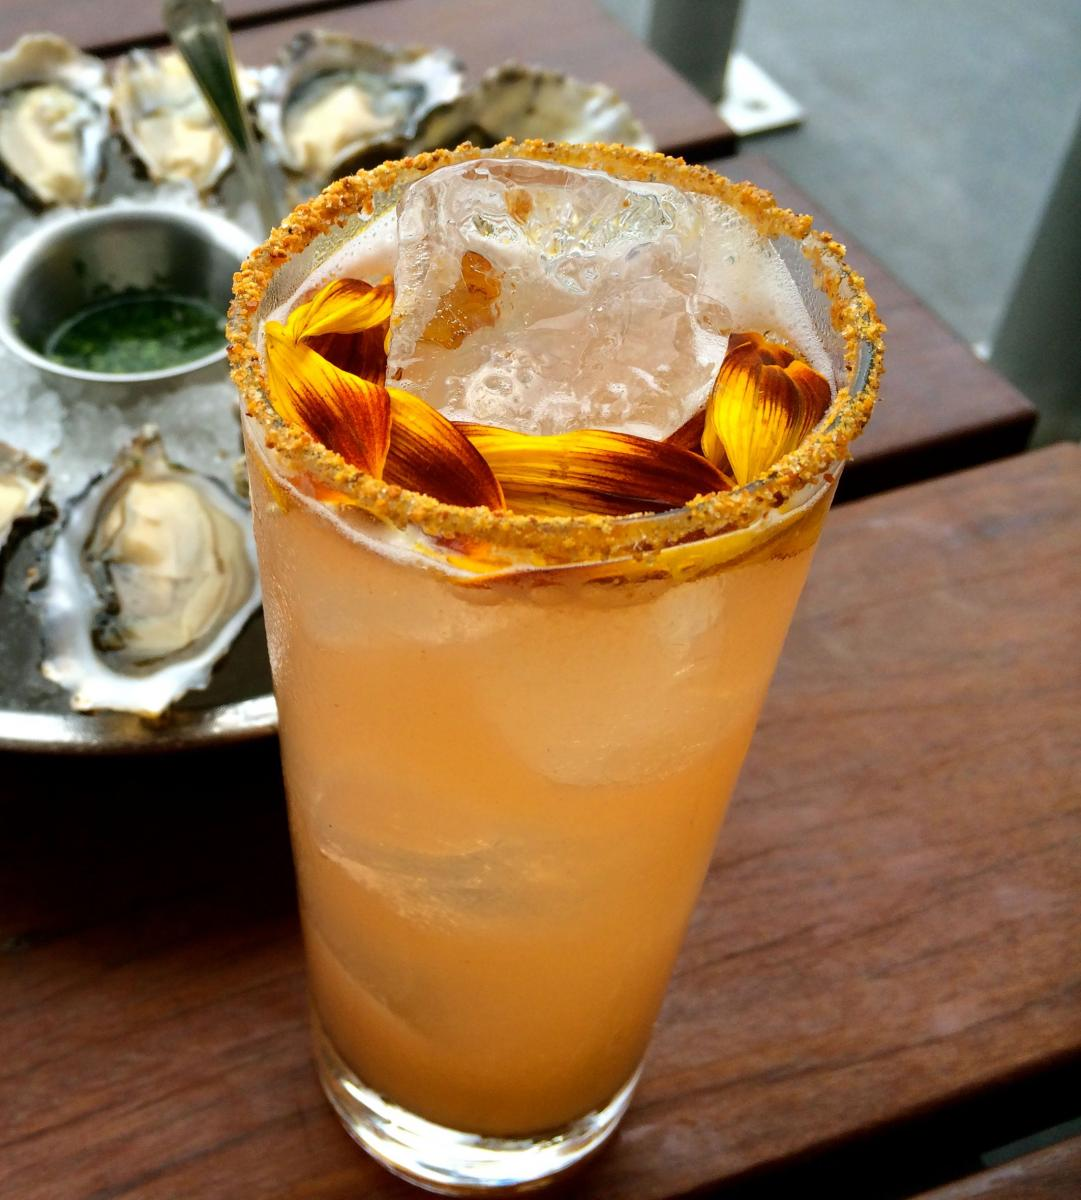 Hog Island The Indian Summer Peach Cocktail